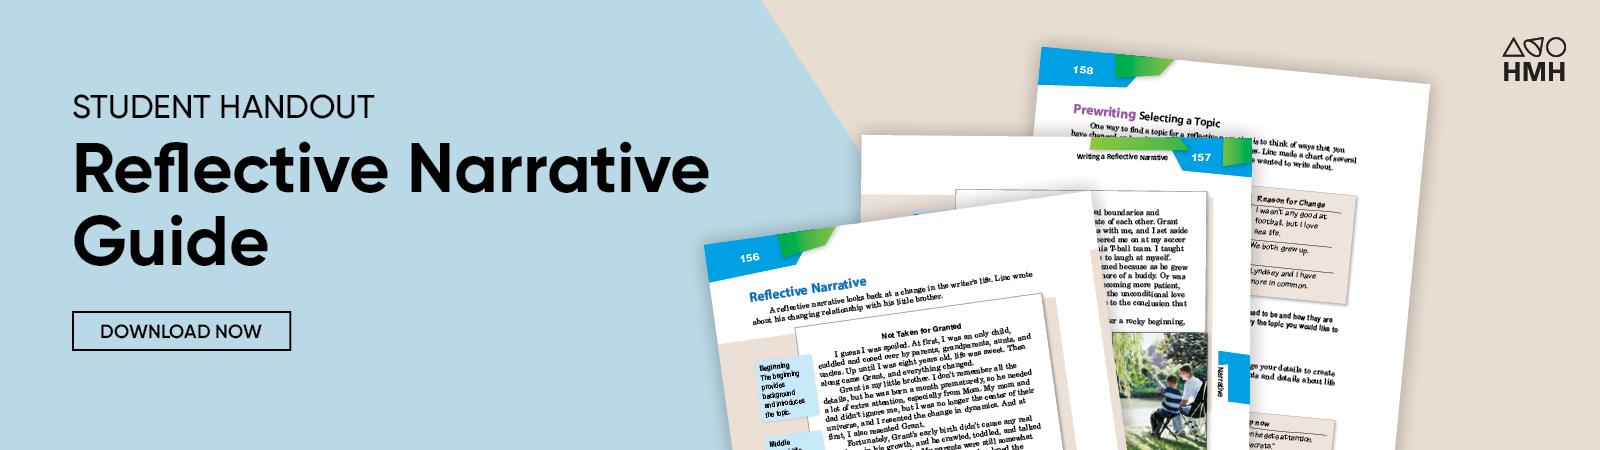 How to Write a Reflective Narrative Essay   Houghton Mifflin Harcourt